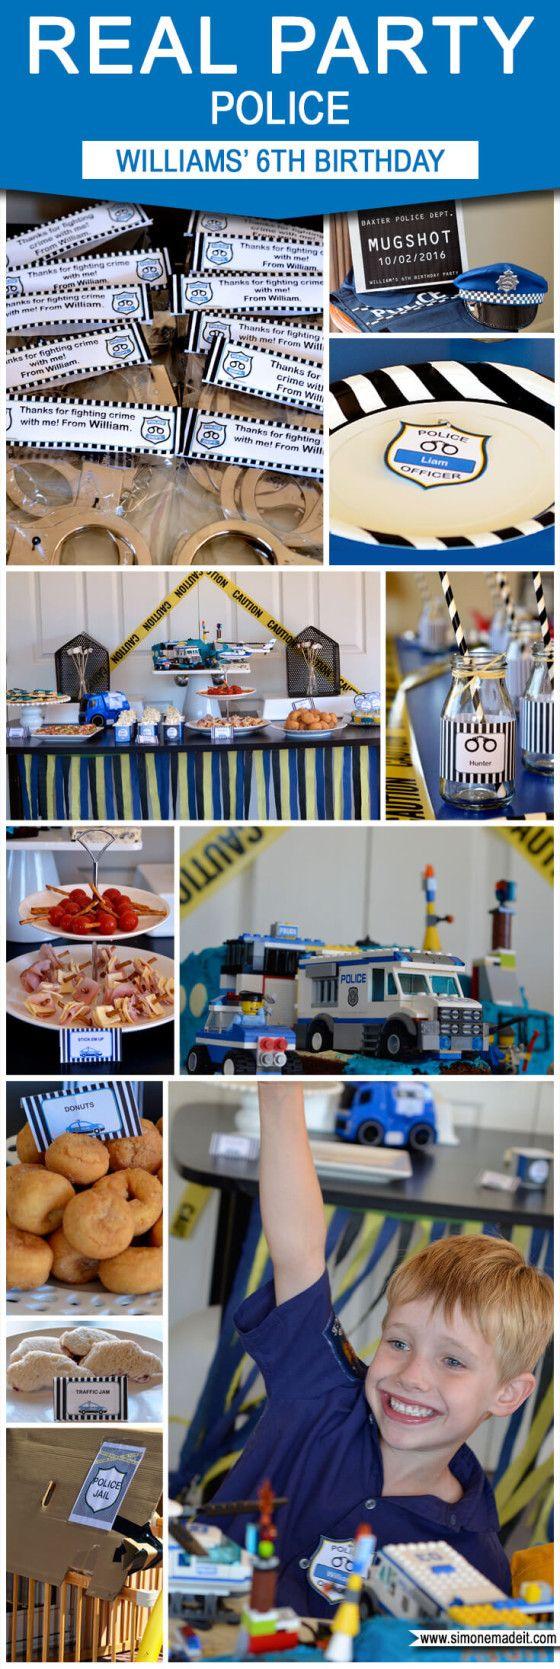 Williams' 6th Police Birthday Party | Police Birthday Party Ideas